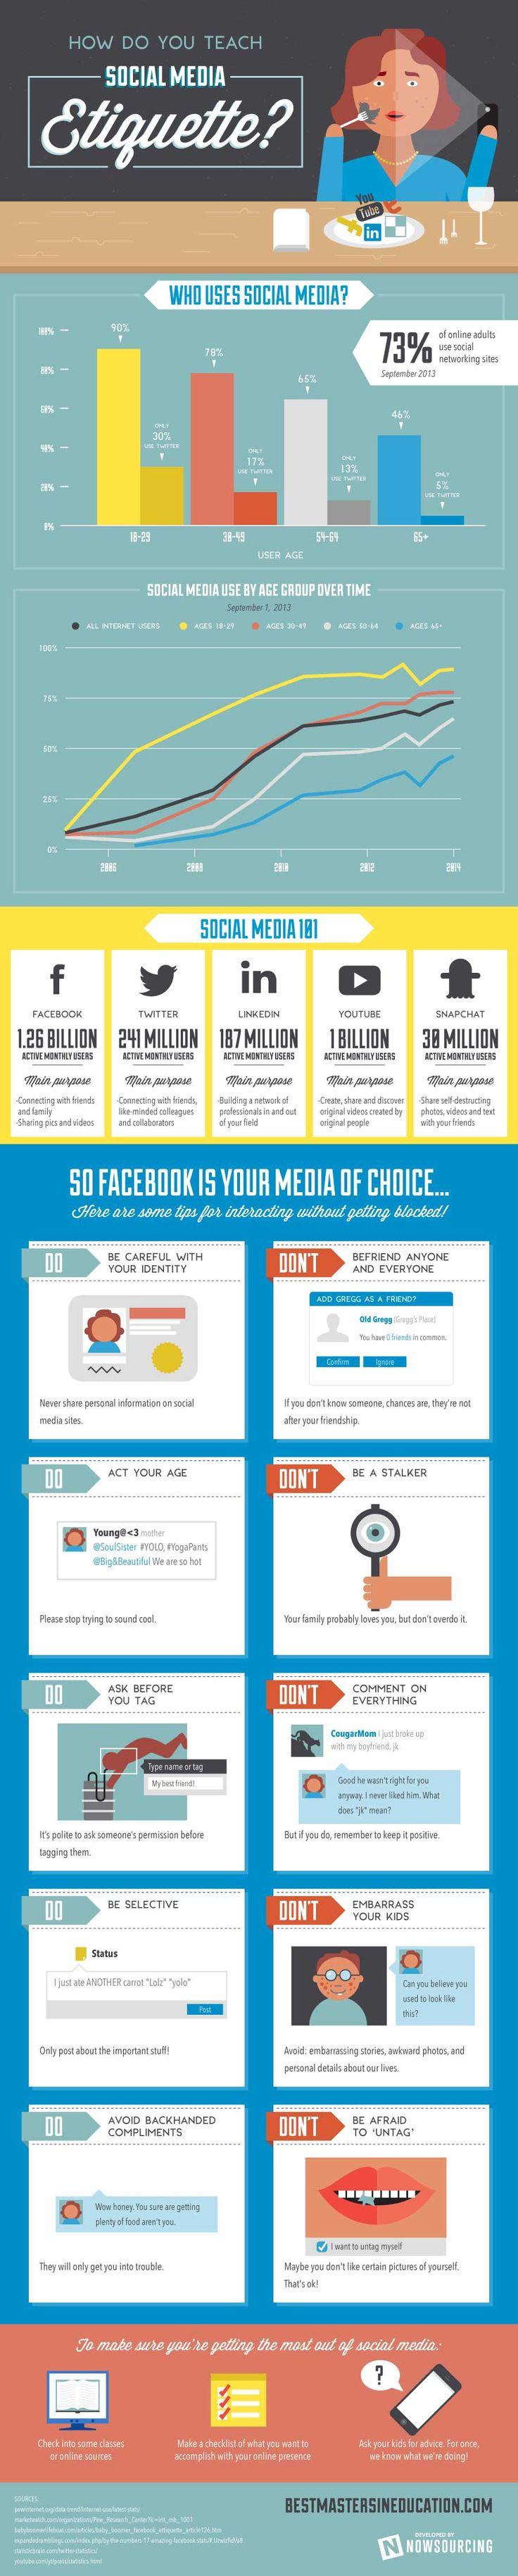 How to Teach Social Media Etiquette